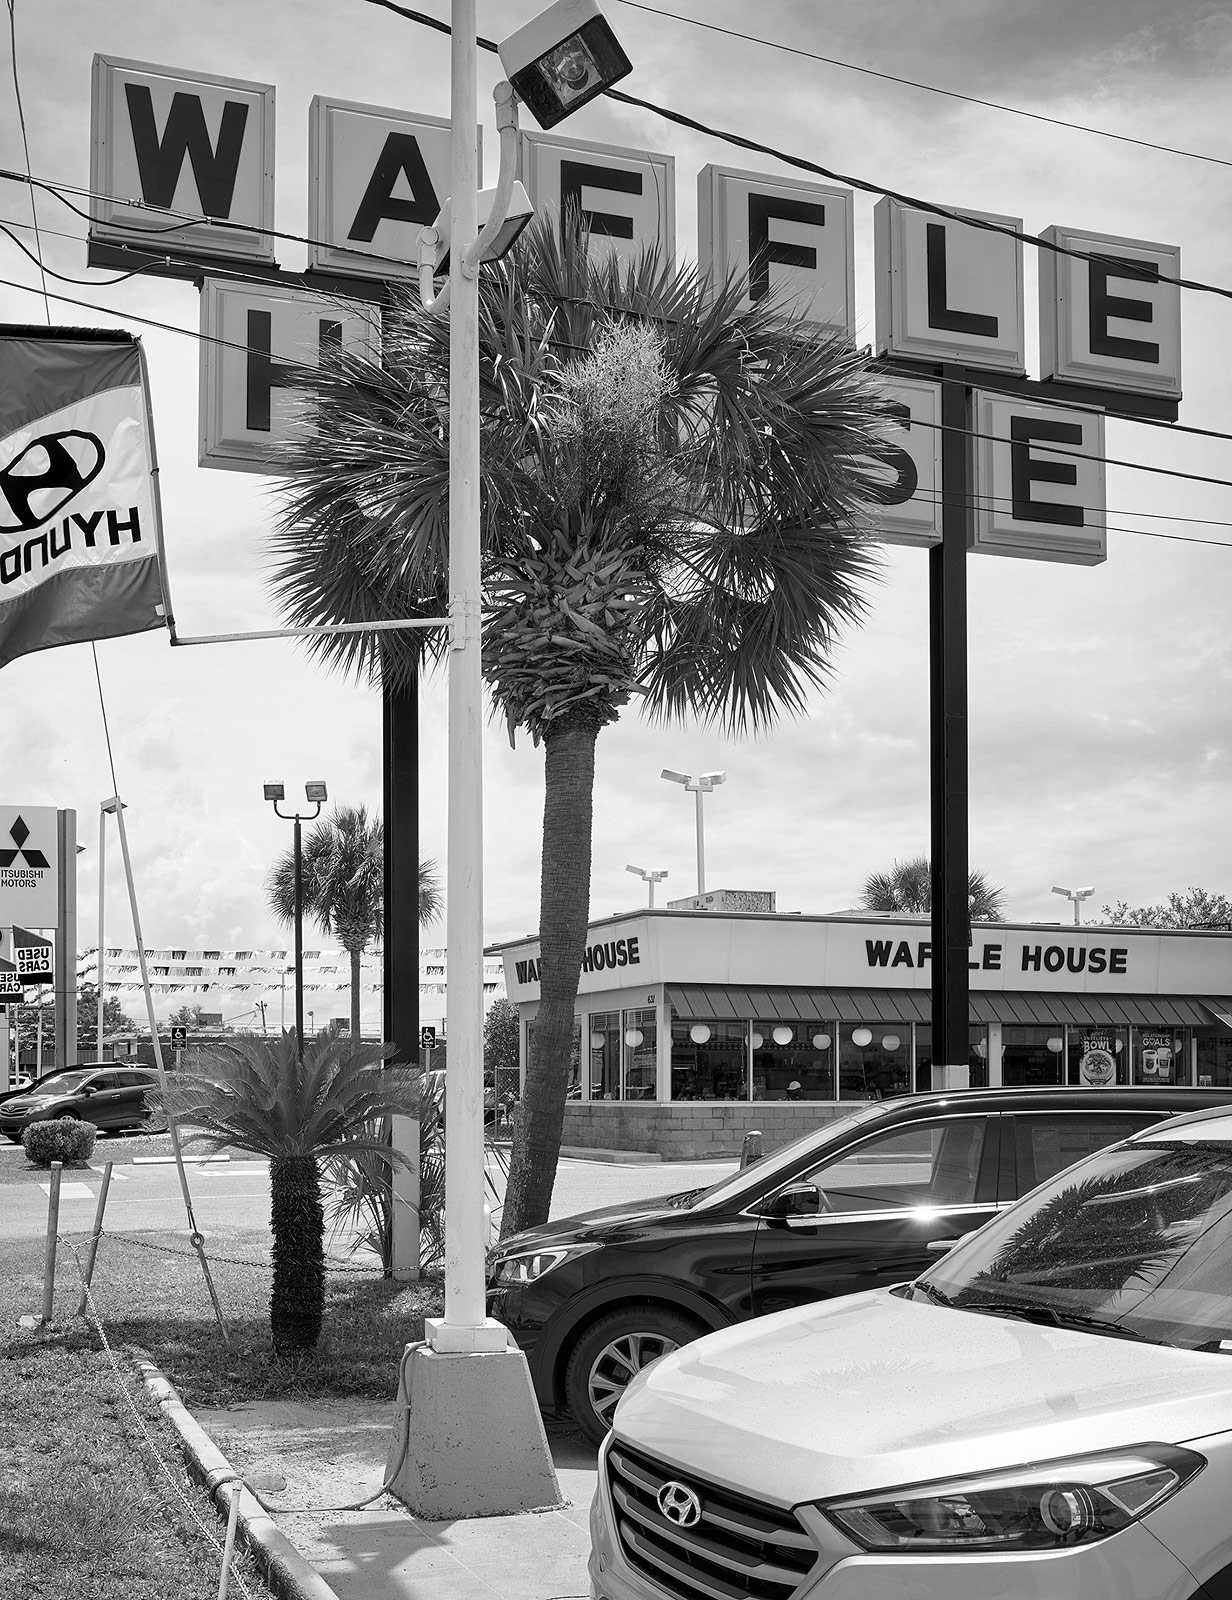 Waffle House, Panama City, FL